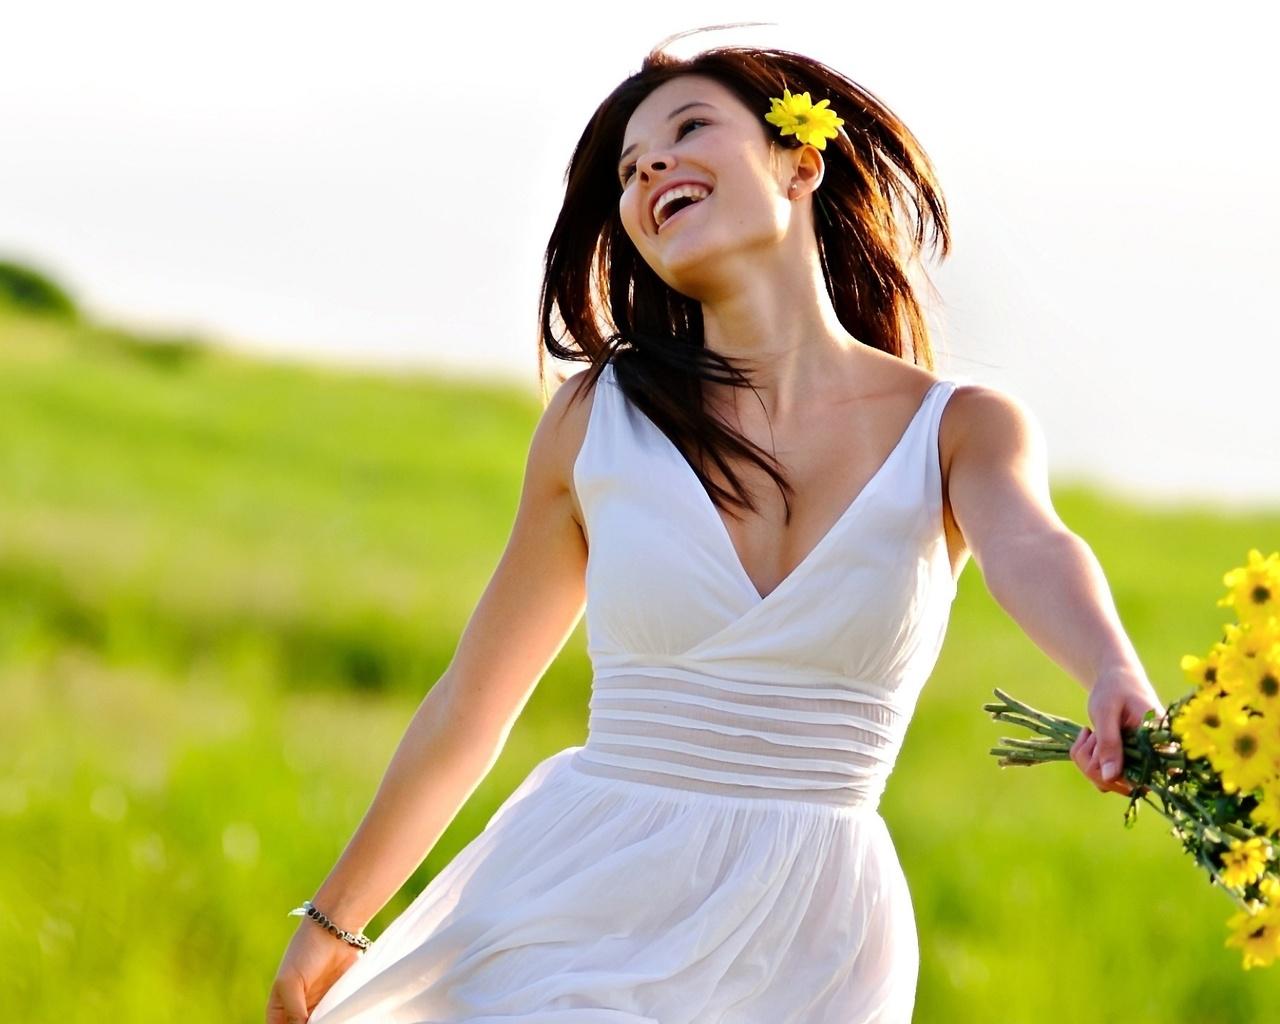 Картинка счастливая девушка